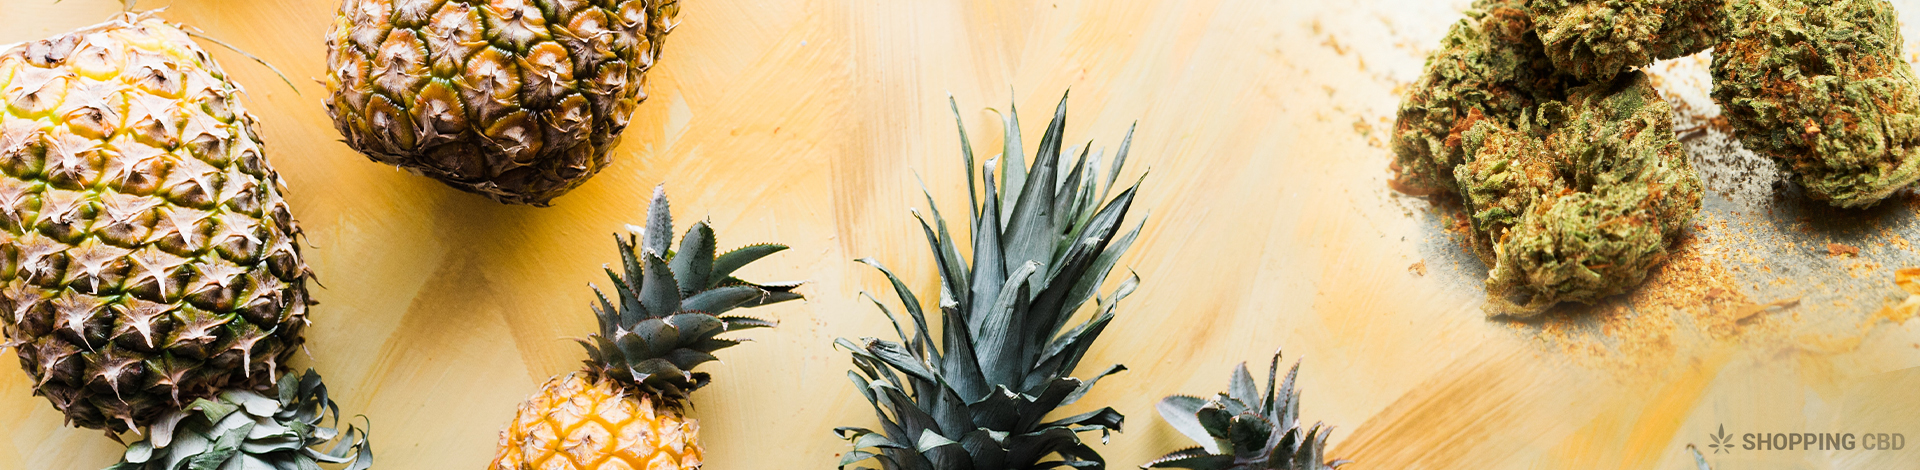 pineapple express cbd terpenes